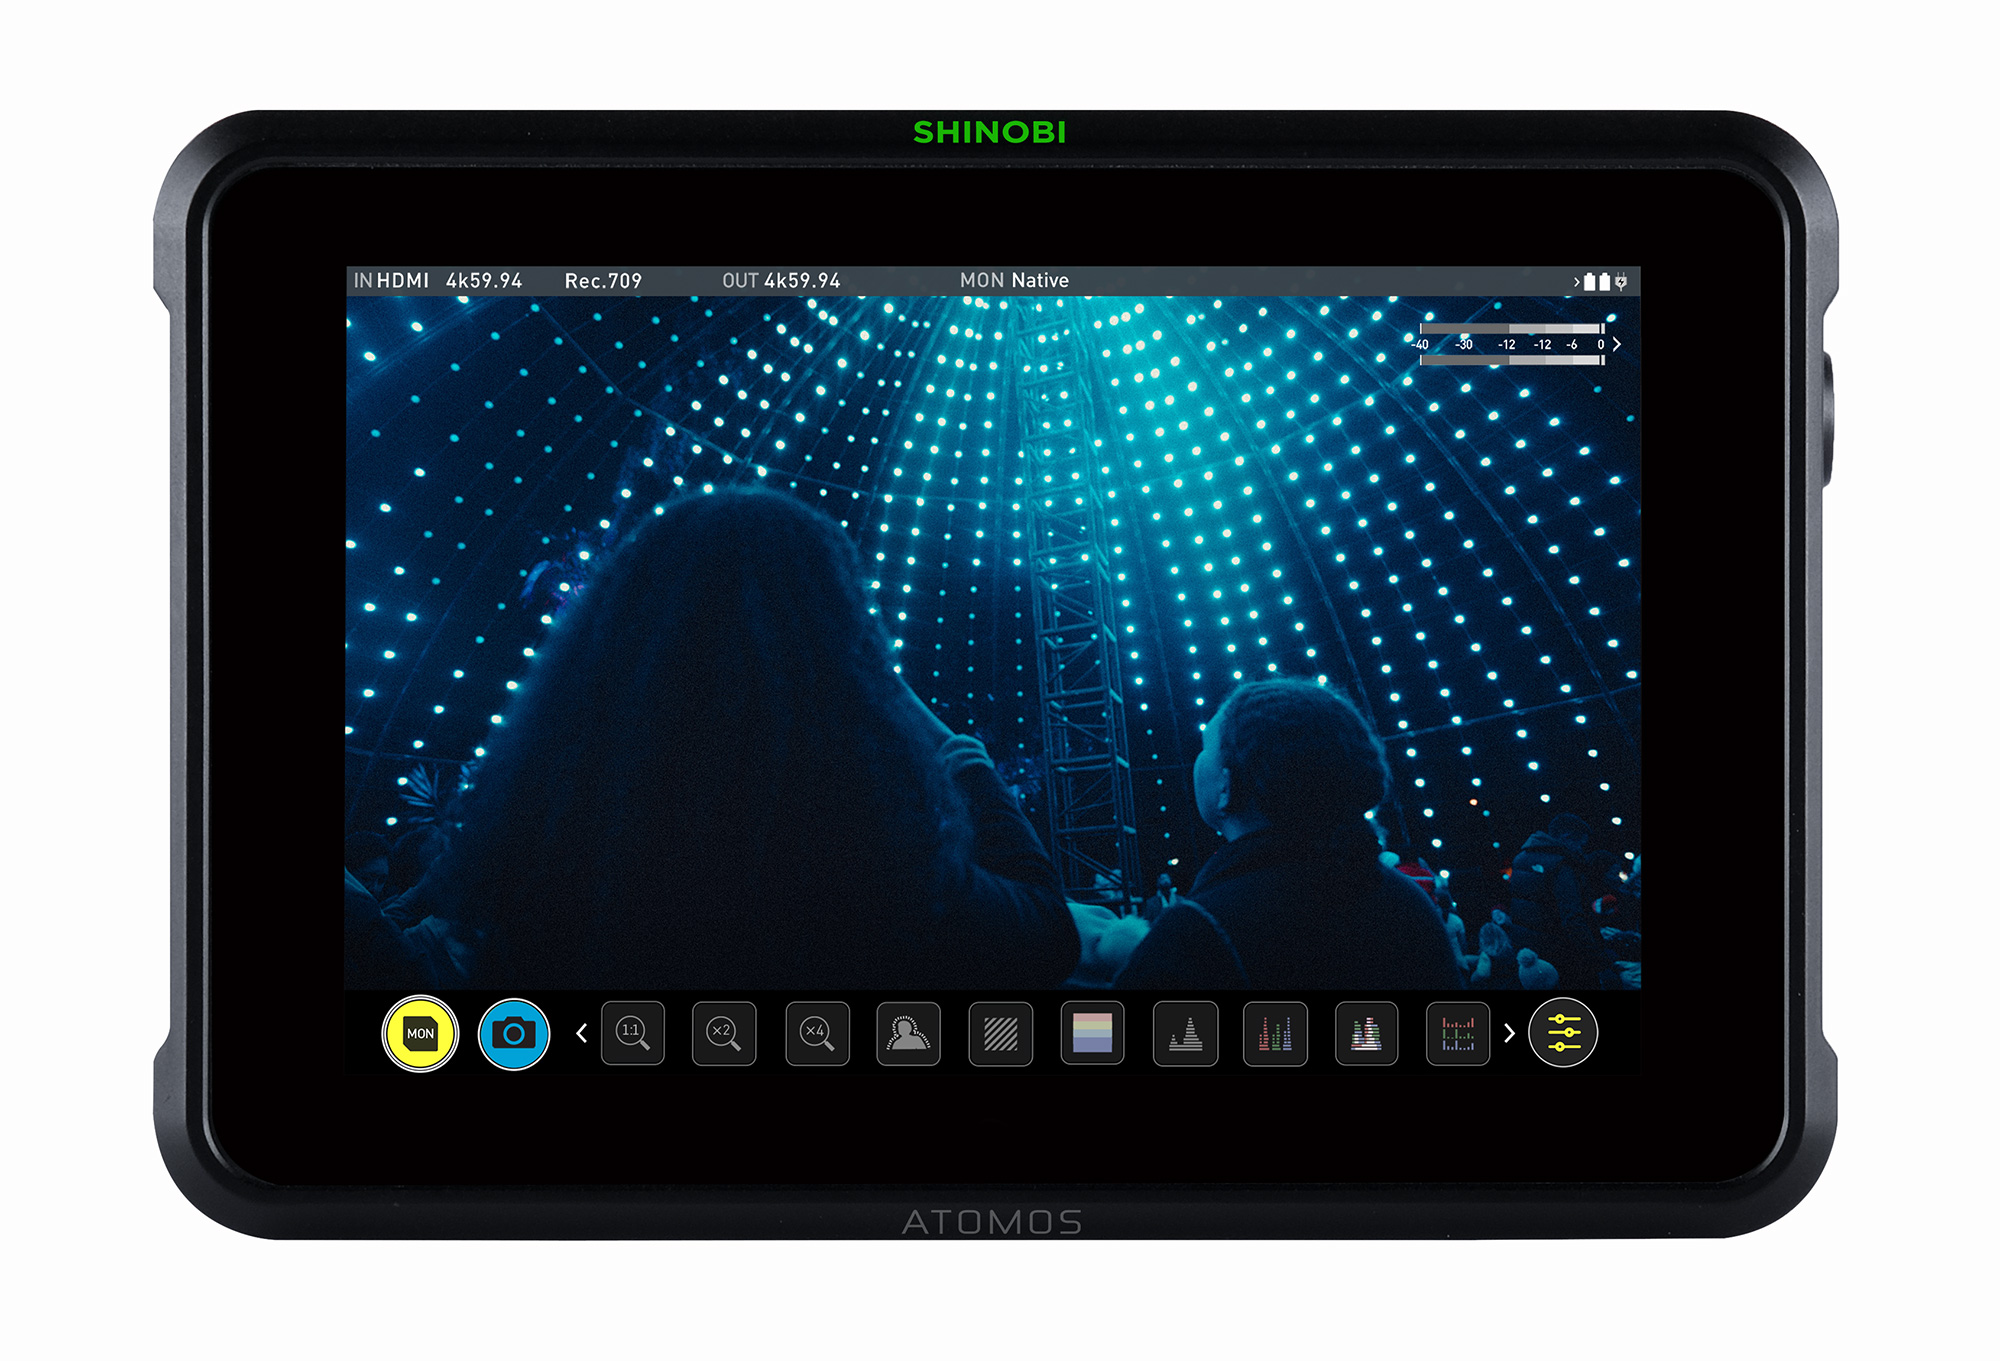 Atomos Announces Shinobi 7 HDR Monitor with 2200 Nits, Touchscreen Camera Control, SDI